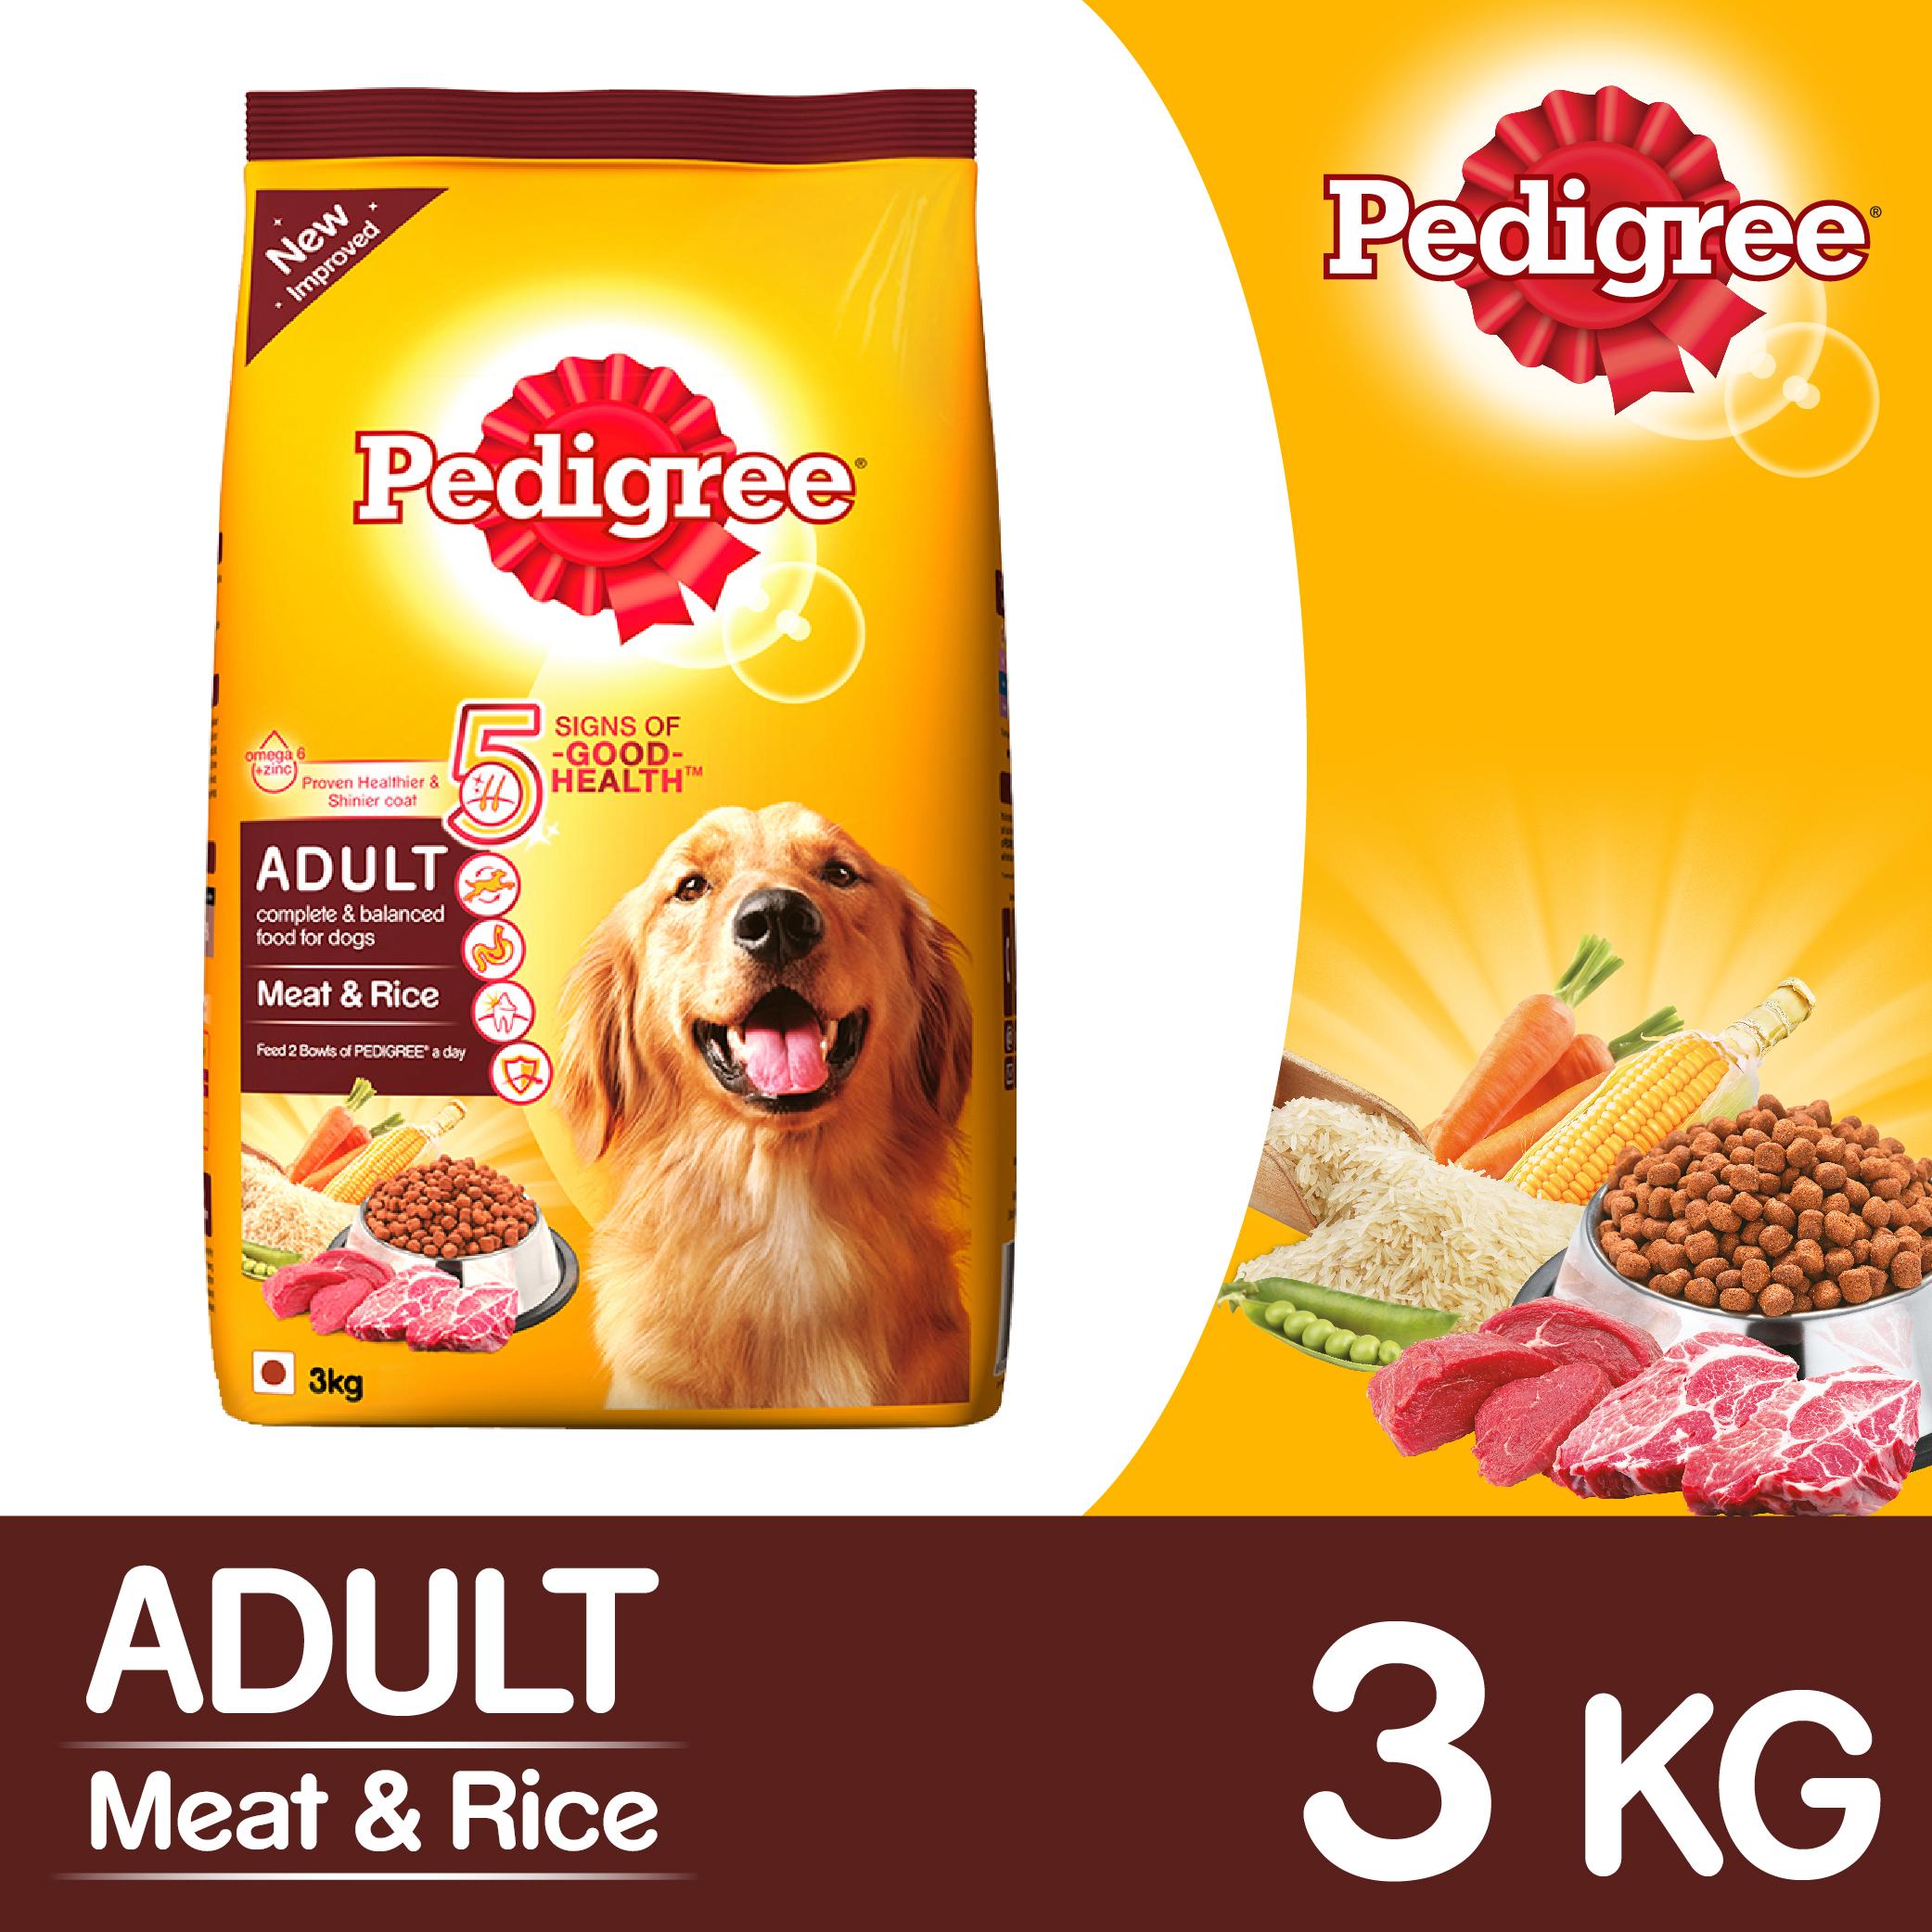 Pedigree Adult Dog Food Meat & Rice - 3 Kg